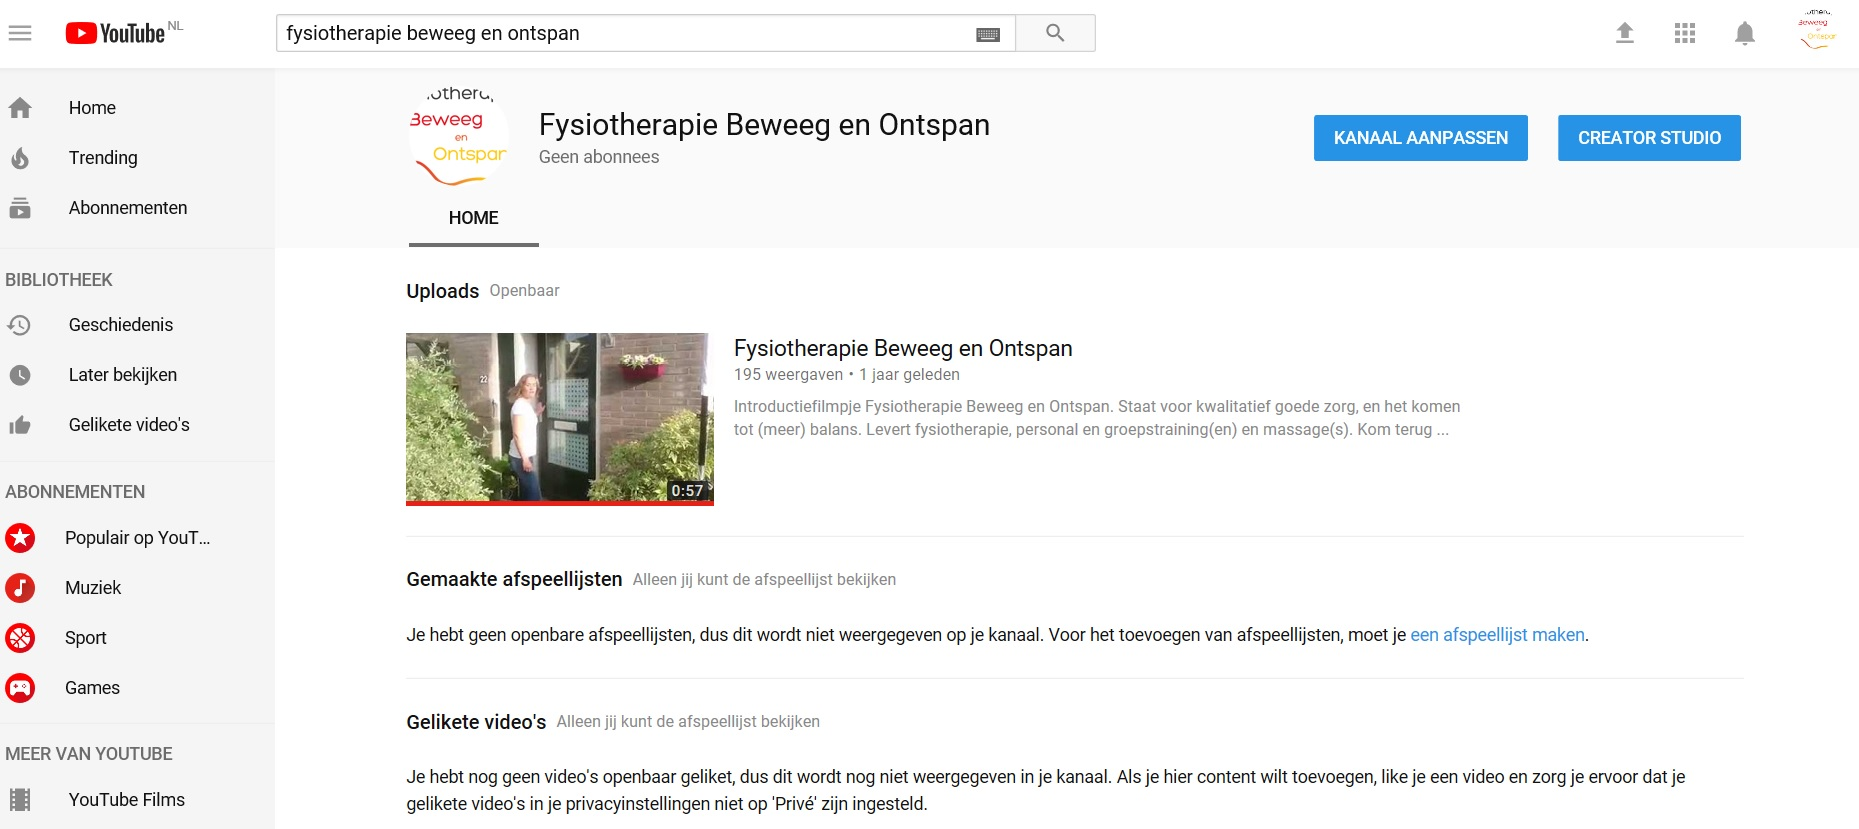 Filmpje YouTube fysiotherapie